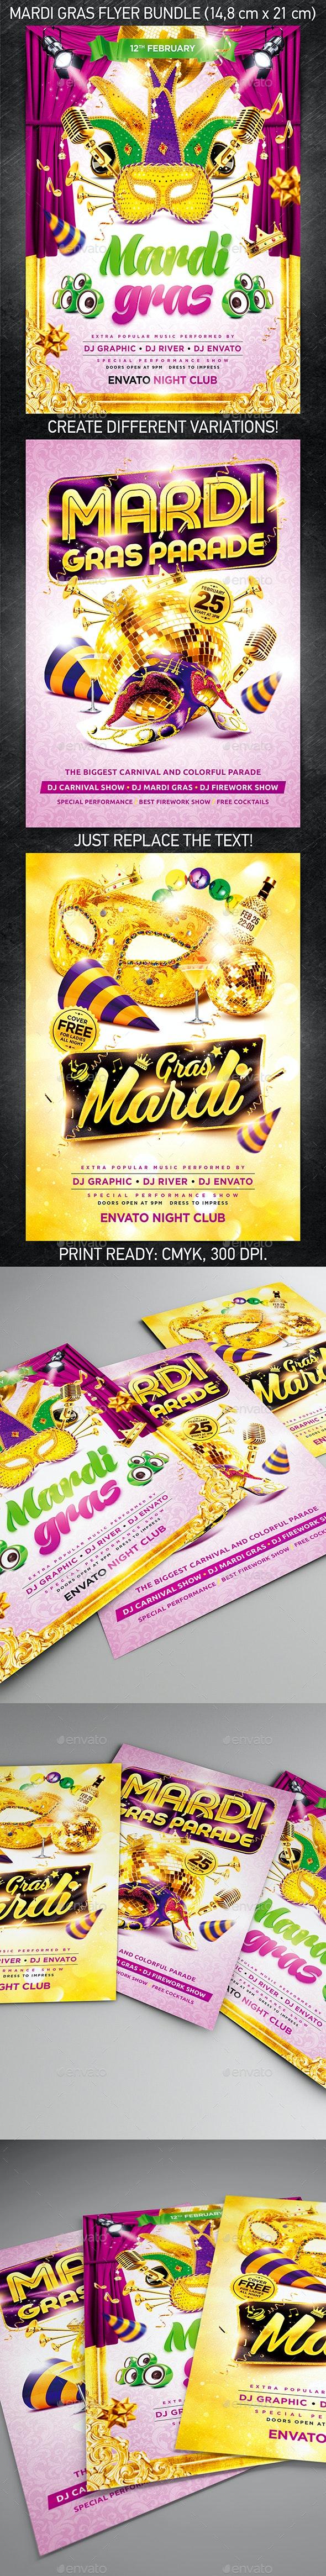 Mardi Gras Party Flyer Bundle - Holidays Events